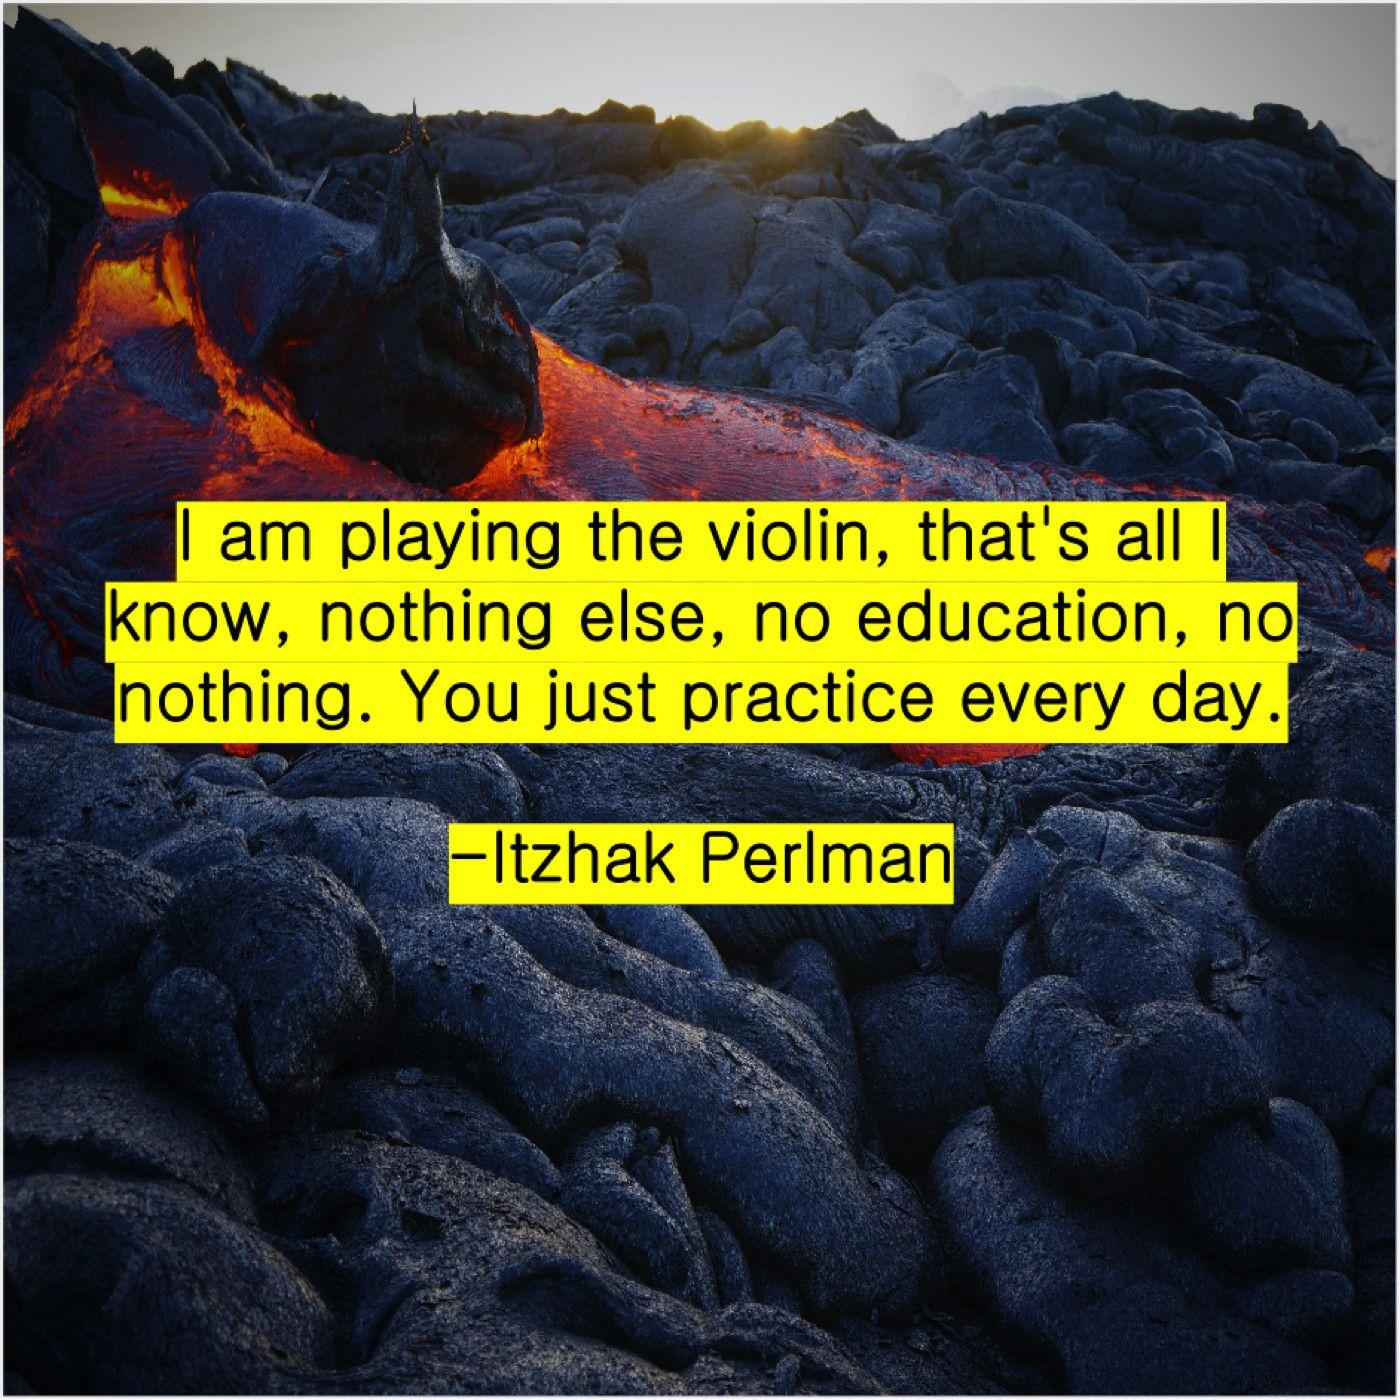 Itzhak Perlman I Am Playing The Violin America Ferrera Kid Cudi Amber Heard